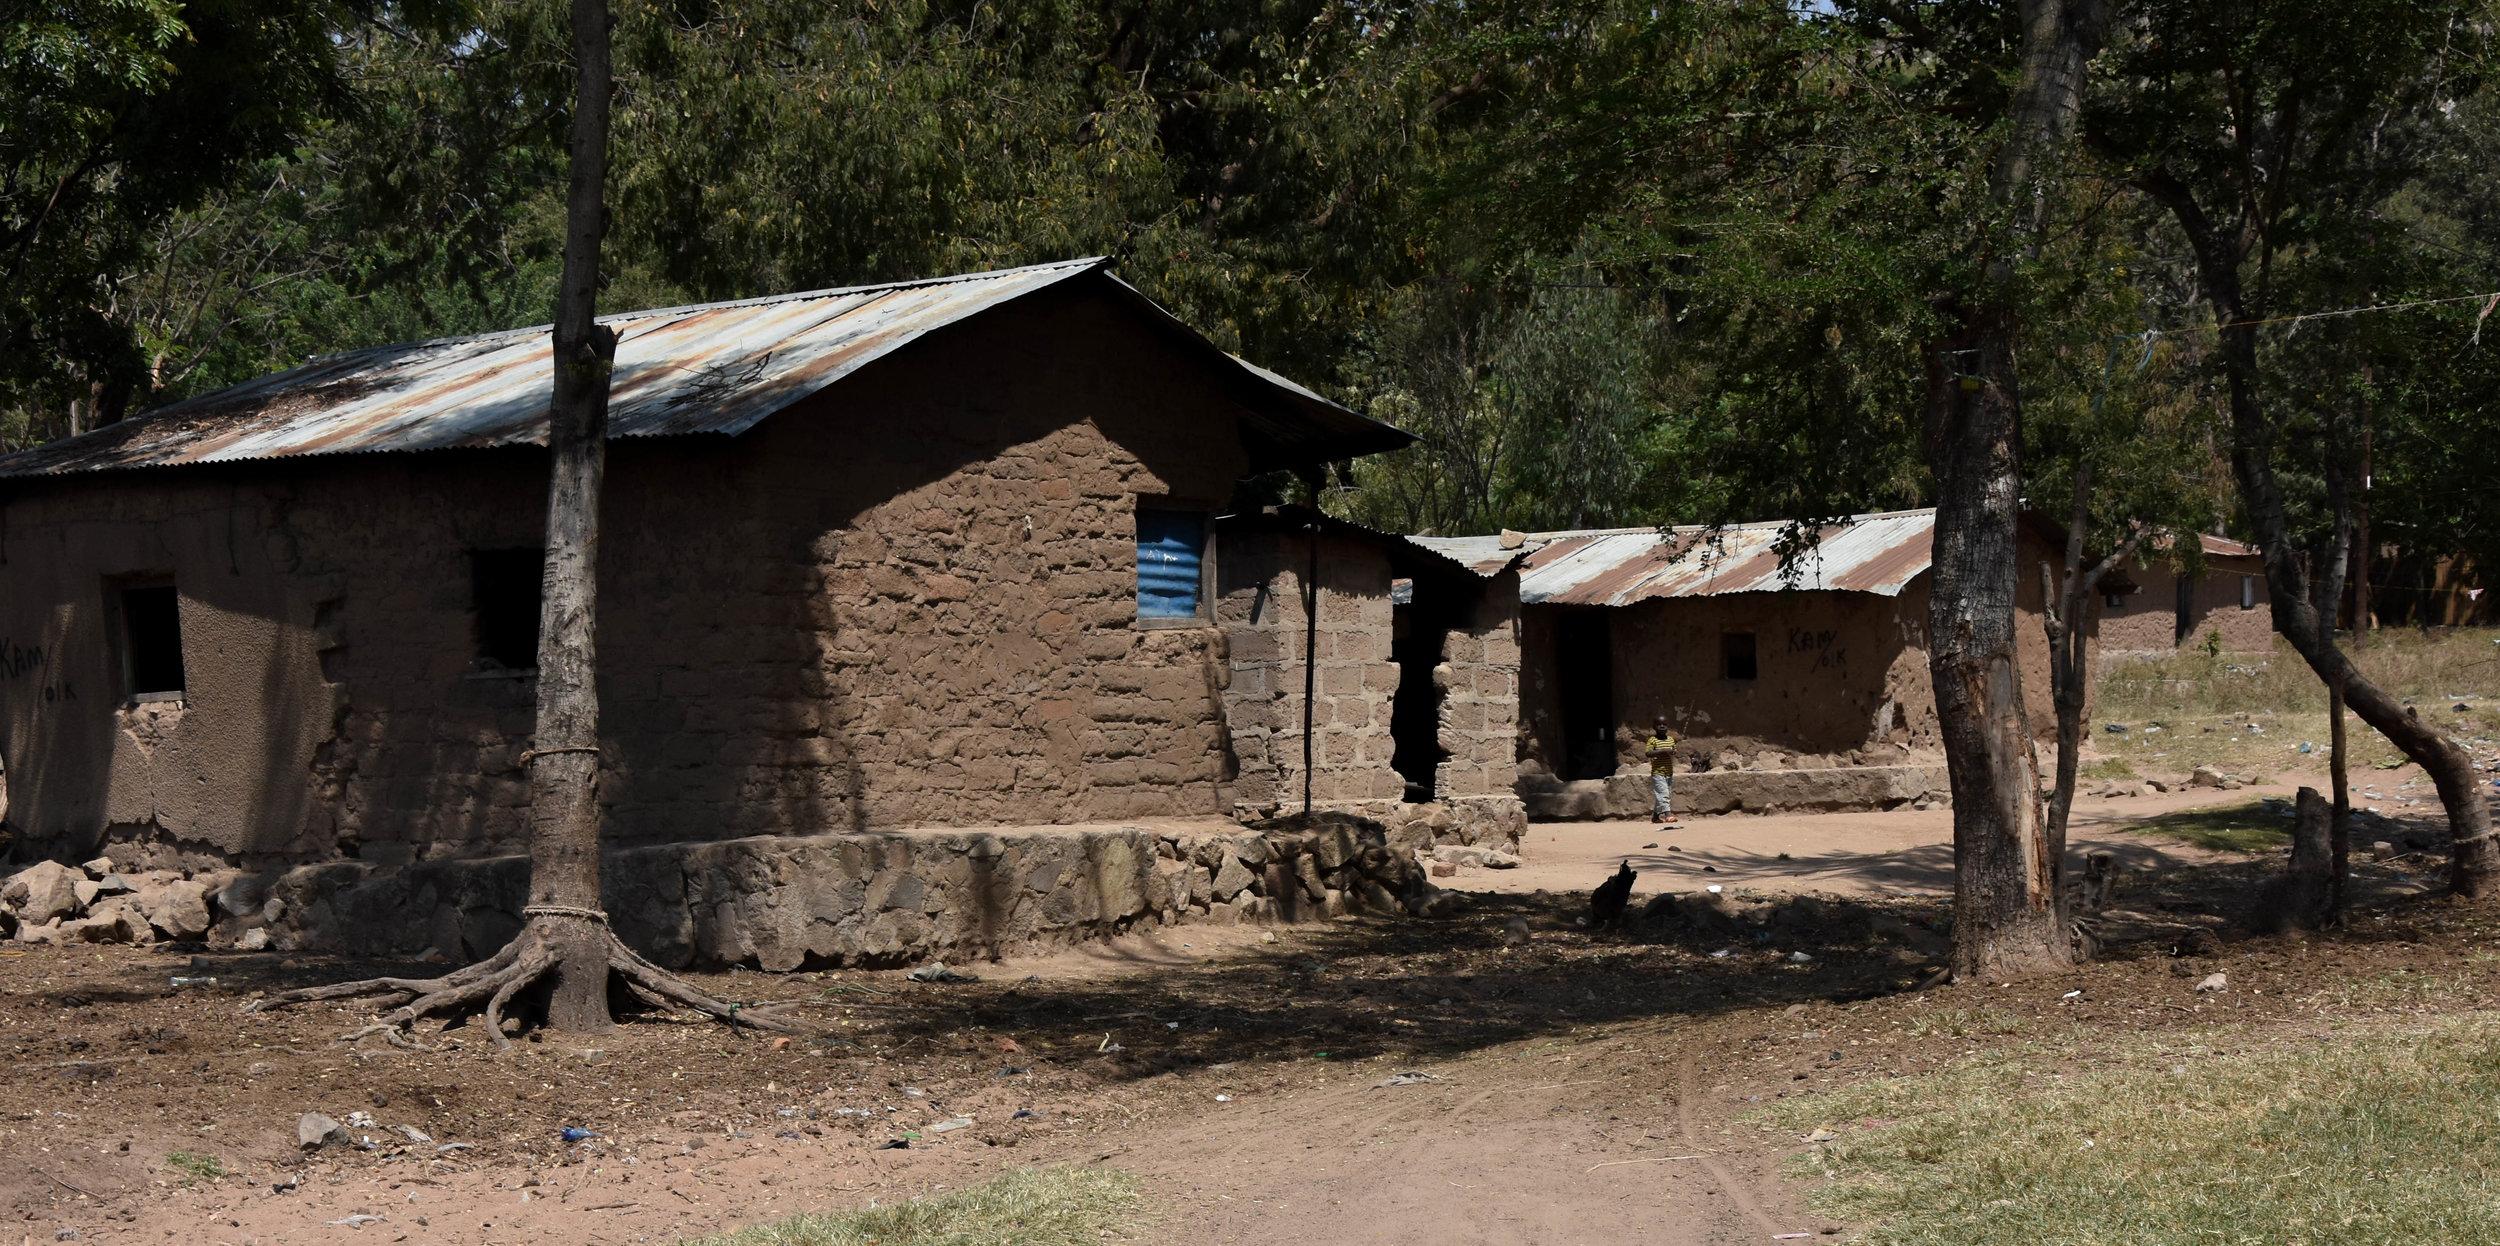 Typical housing in Kamanga - the largest village in Nyamatongo Ward